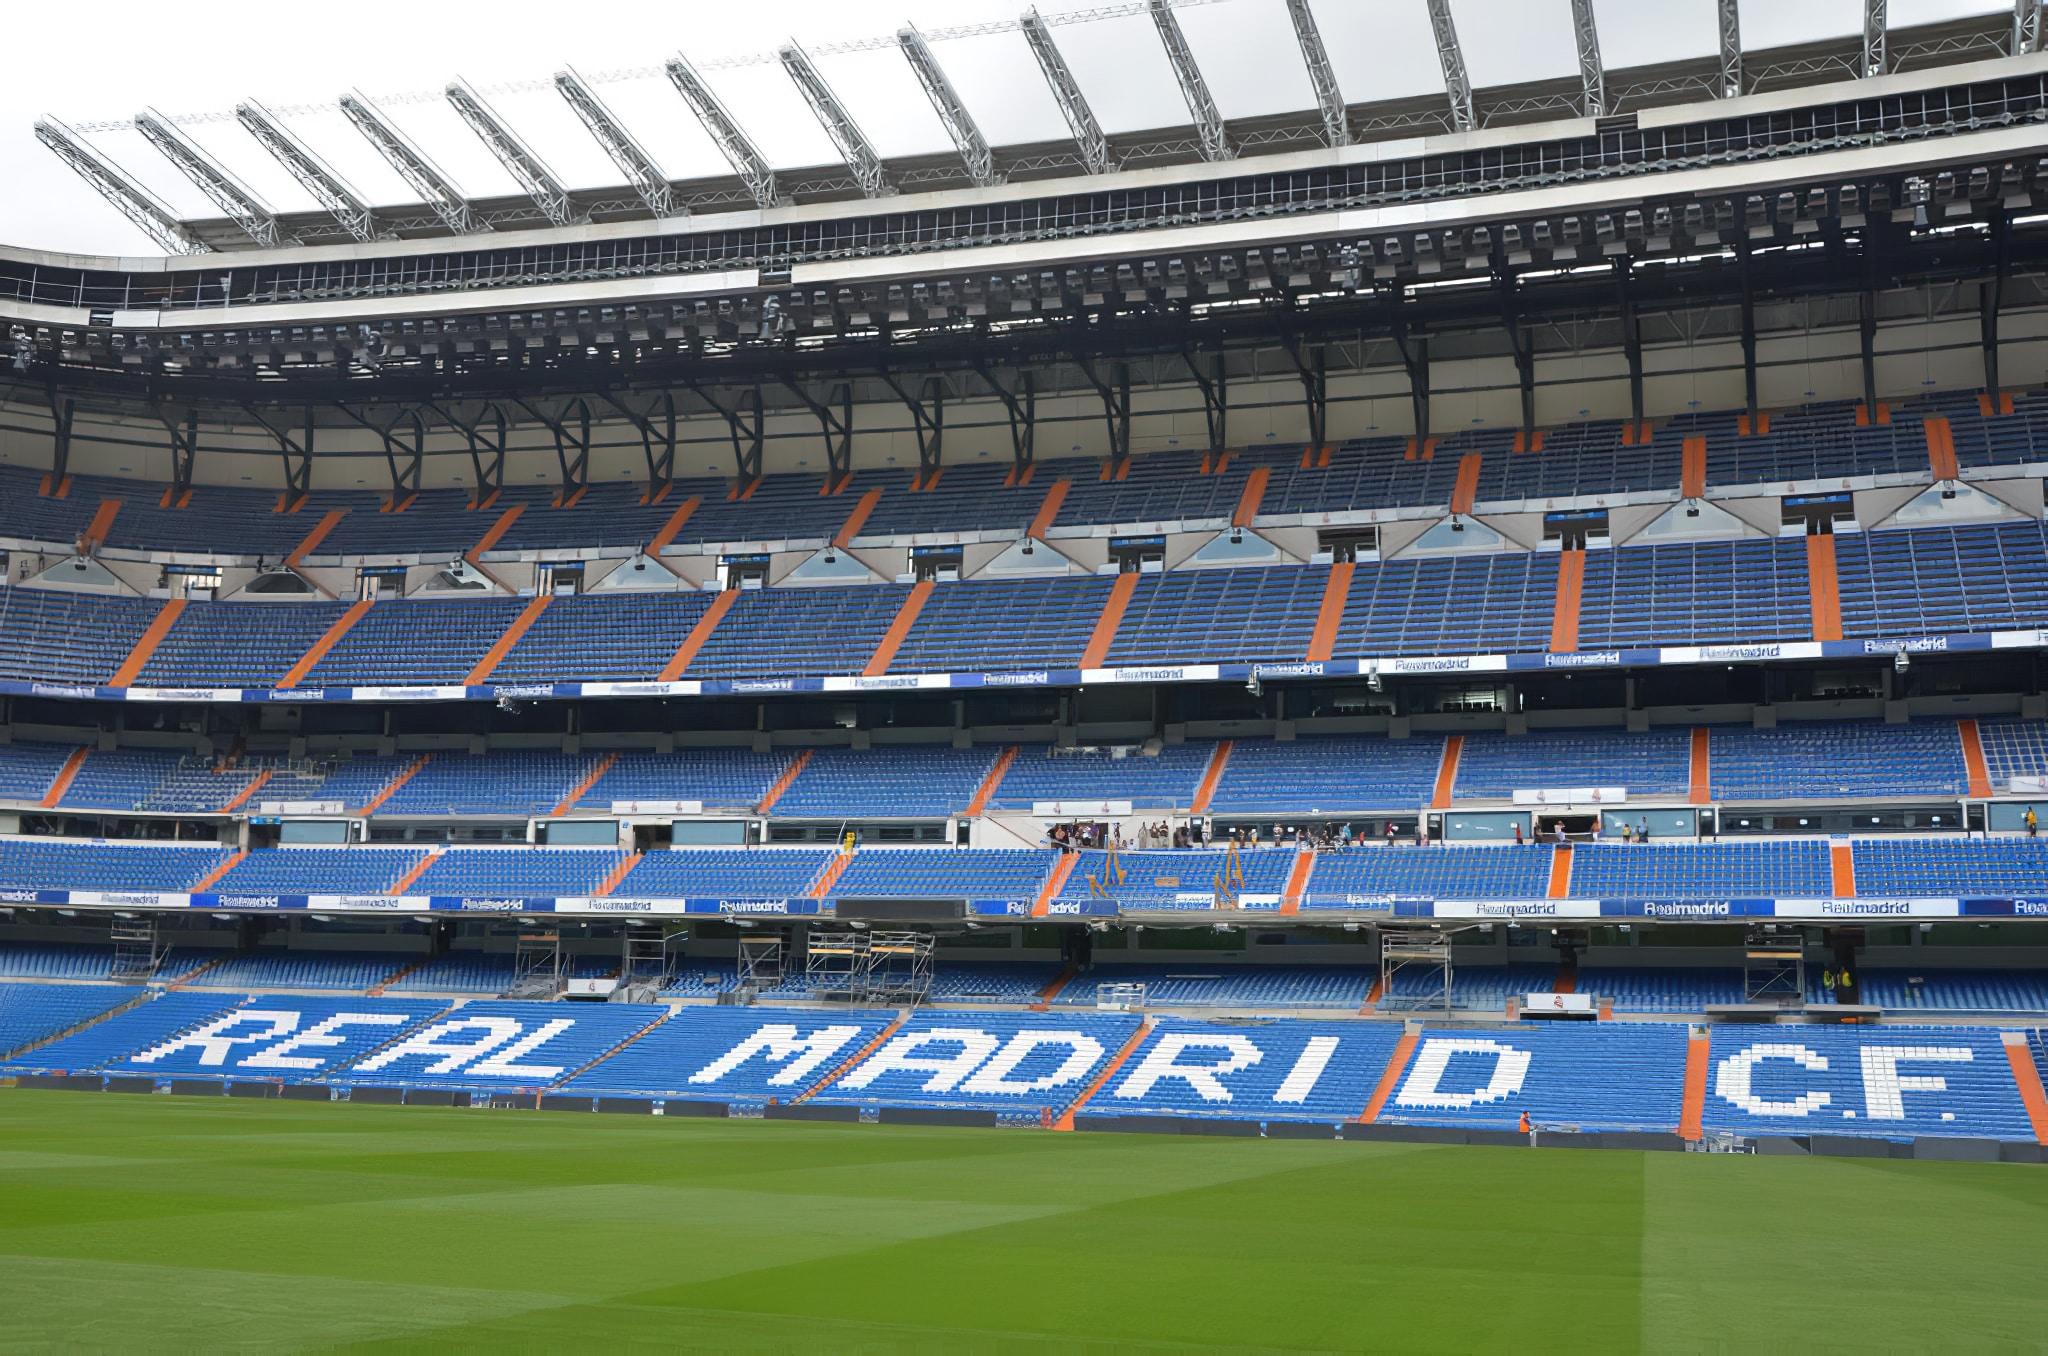 Visiter le stade Santiago Bernabéu à Madrid